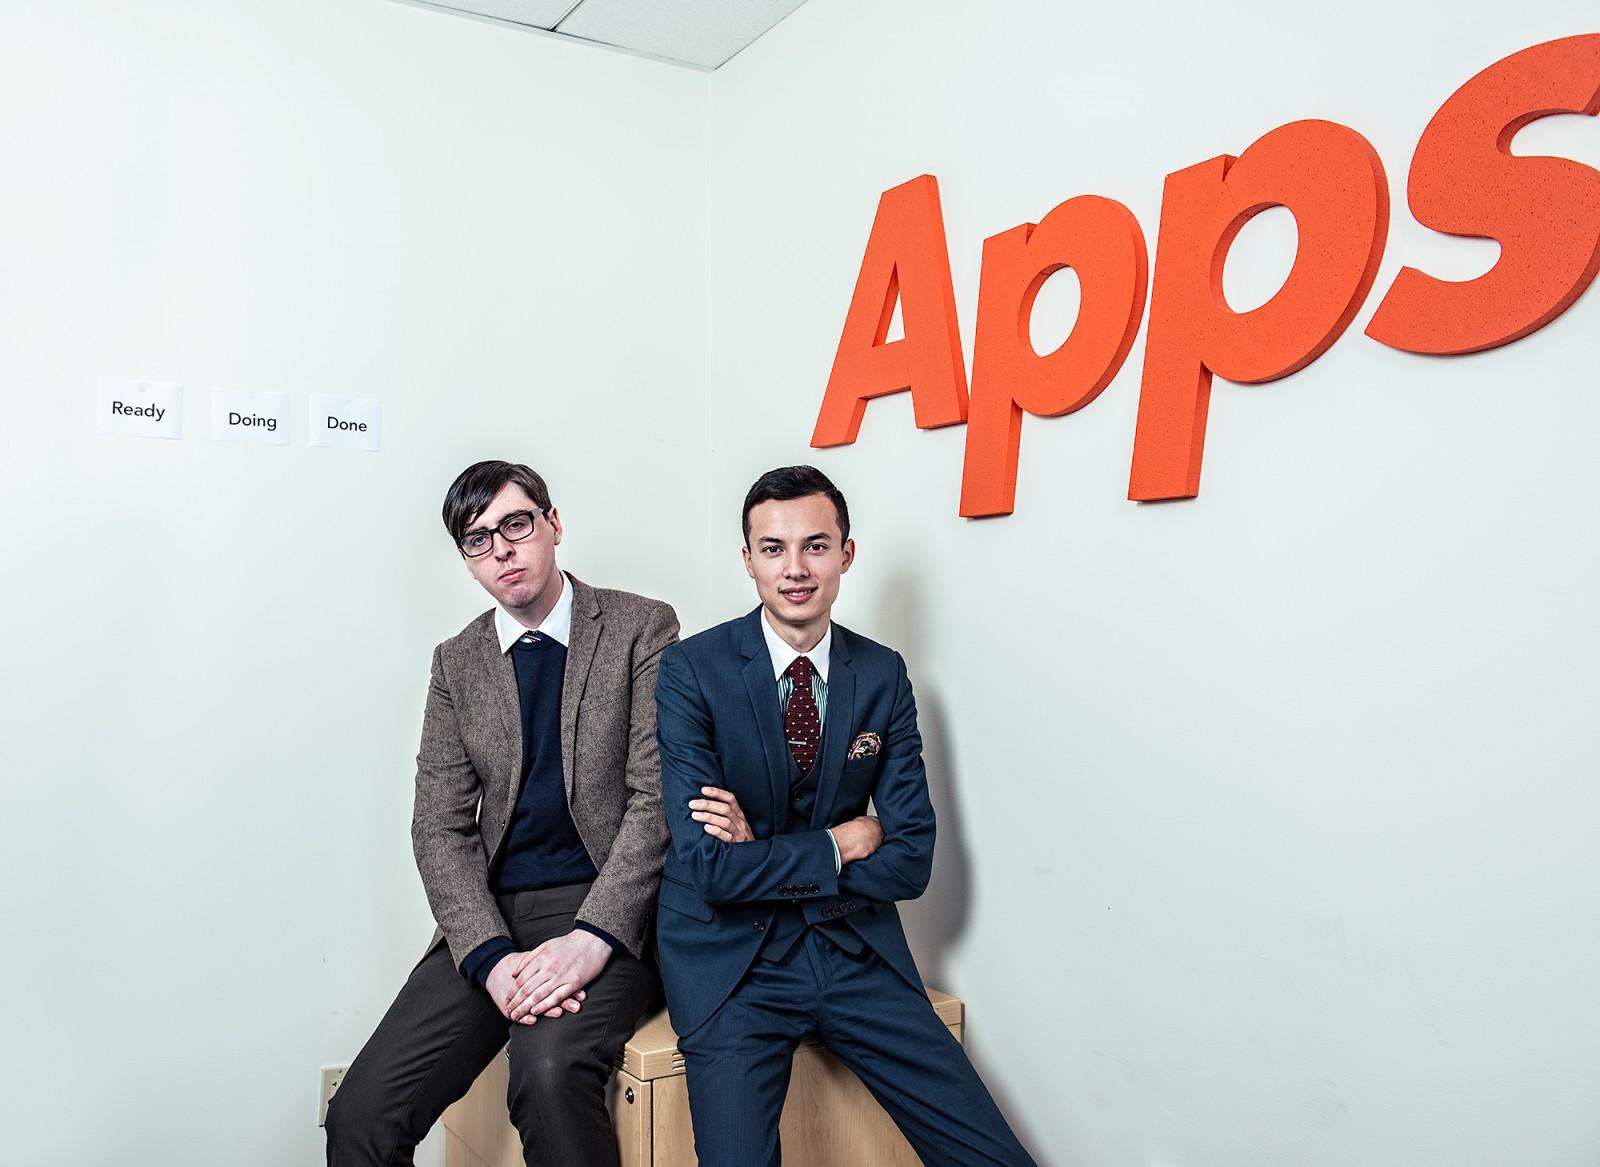 Как Appster побеждает в схватке за таланты